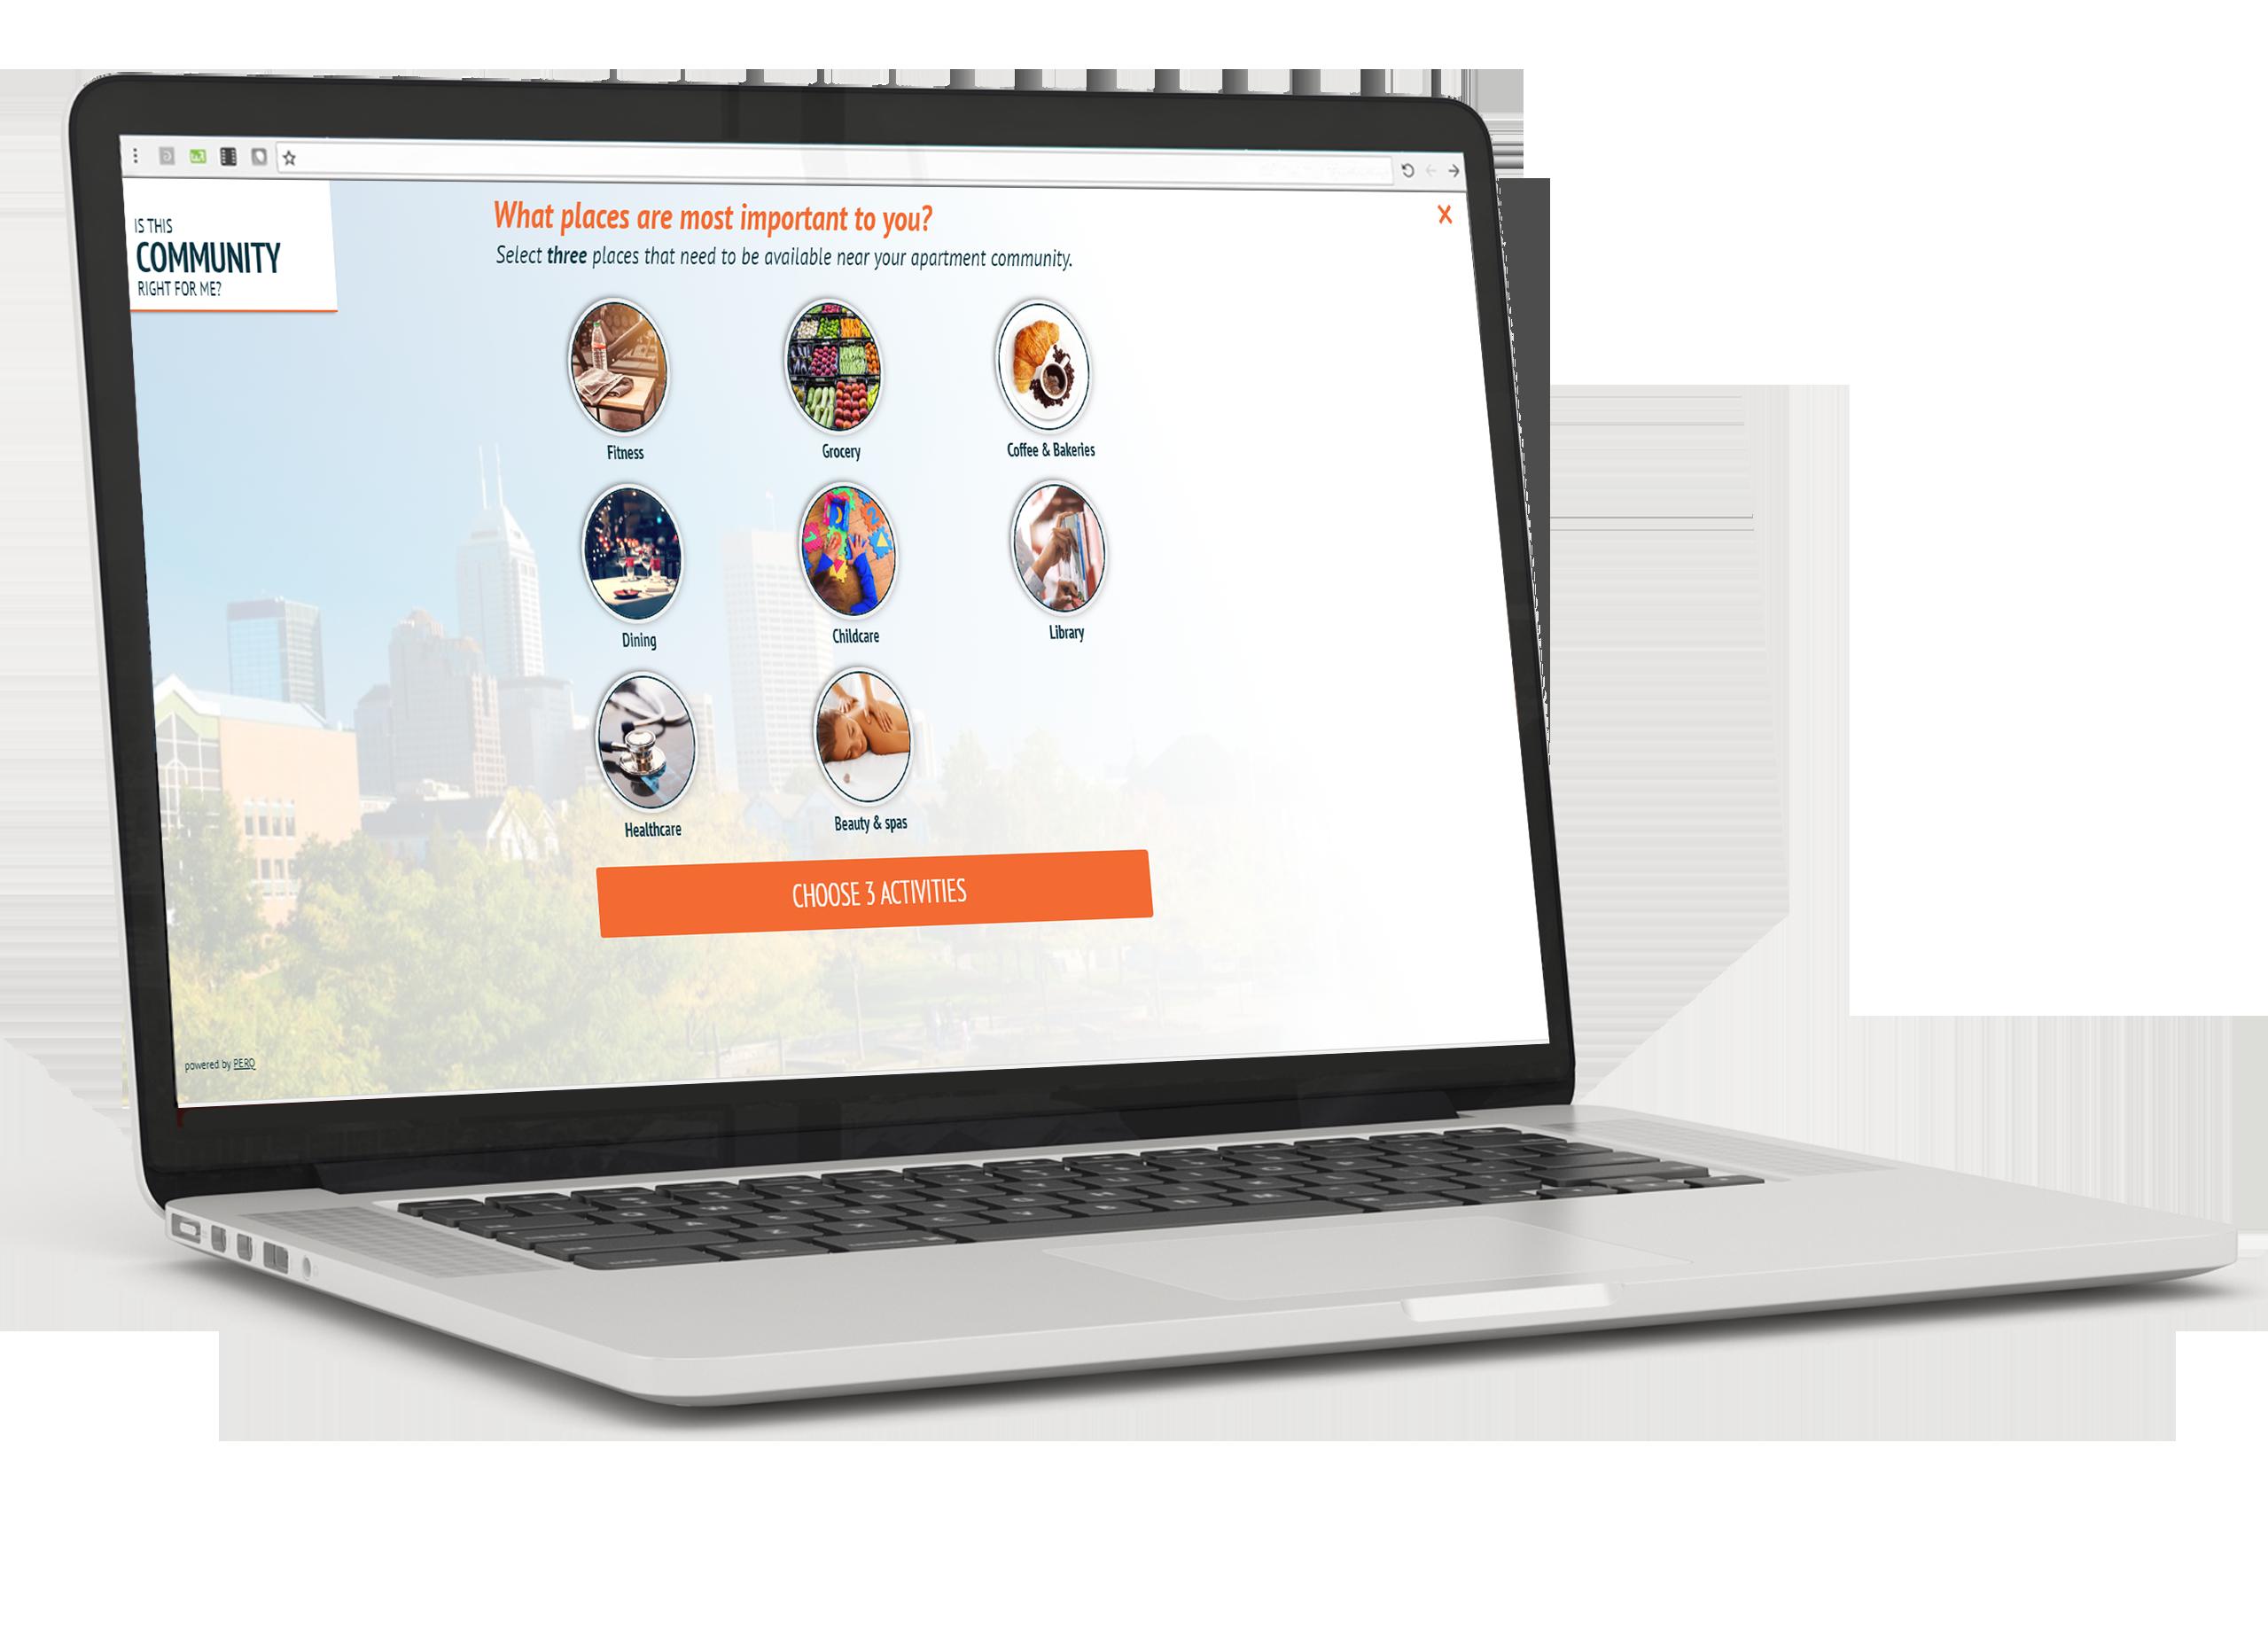 PERQ Demo - PERQ's Community Fit Assessment for Multifamily